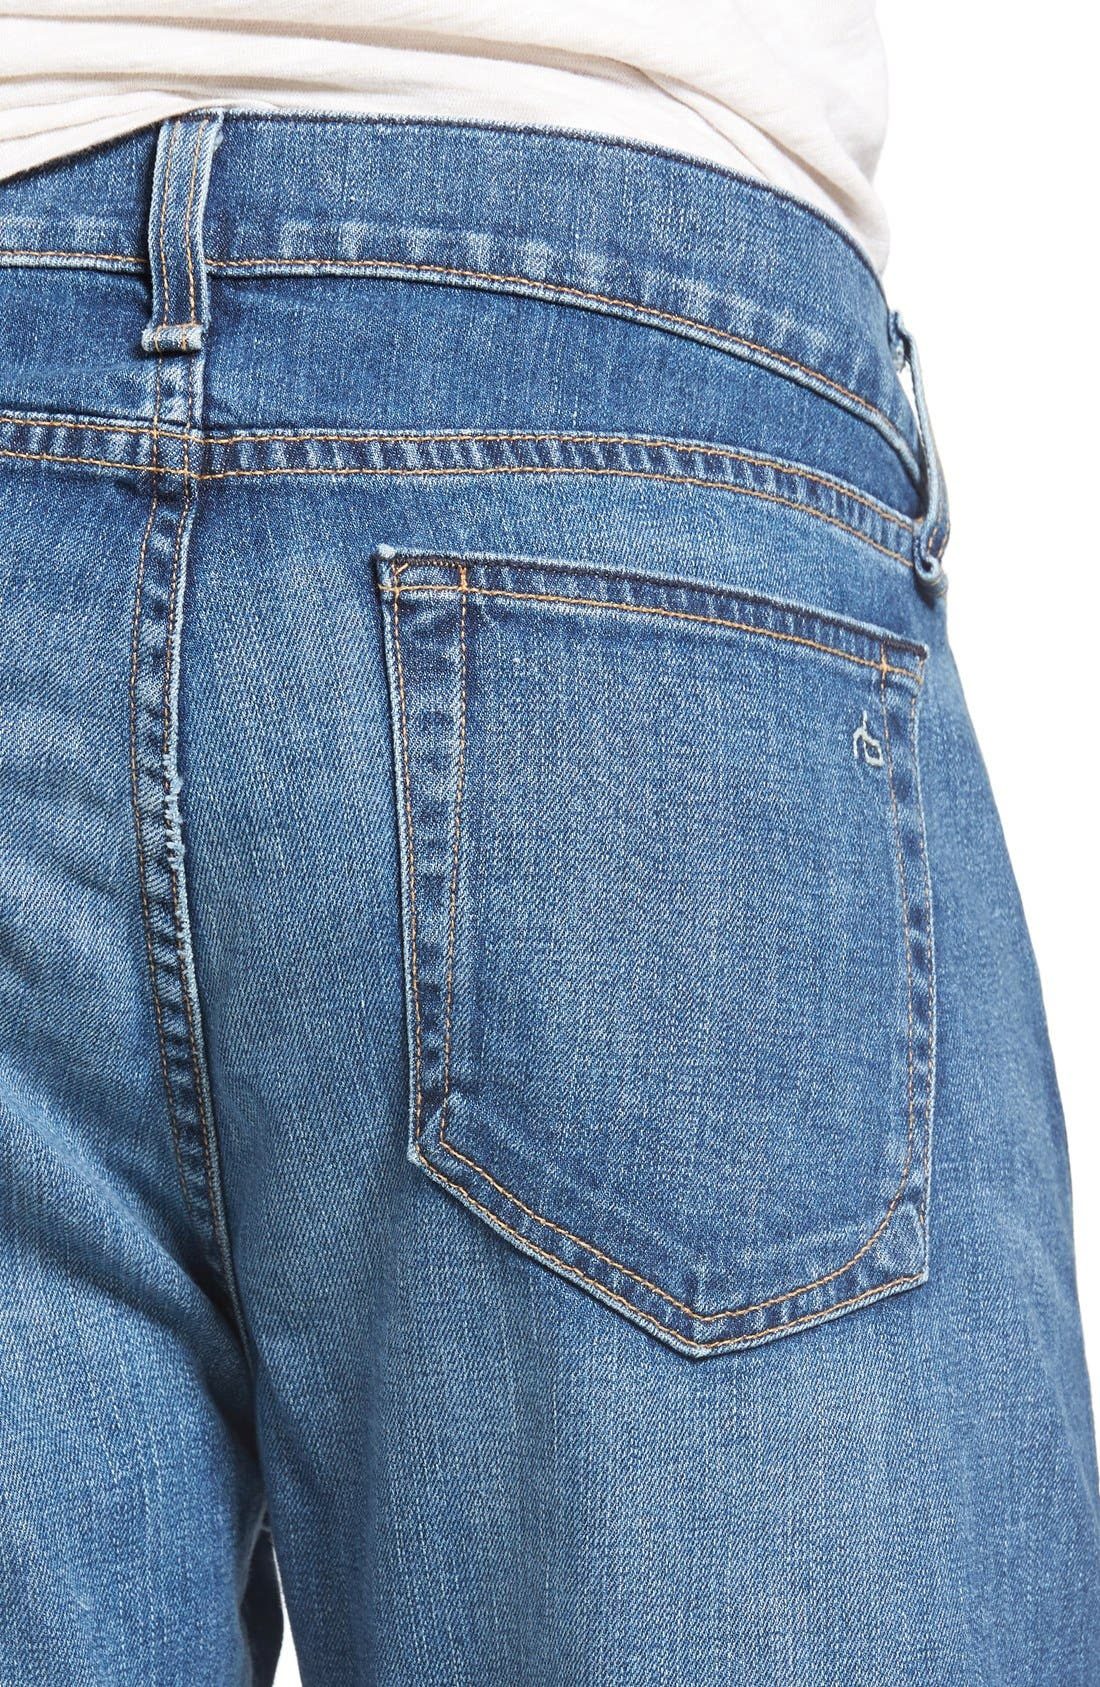 Standard Issue Fit 3 Slim Straight Leg Jeans,                             Alternate thumbnail 6, color,                             421